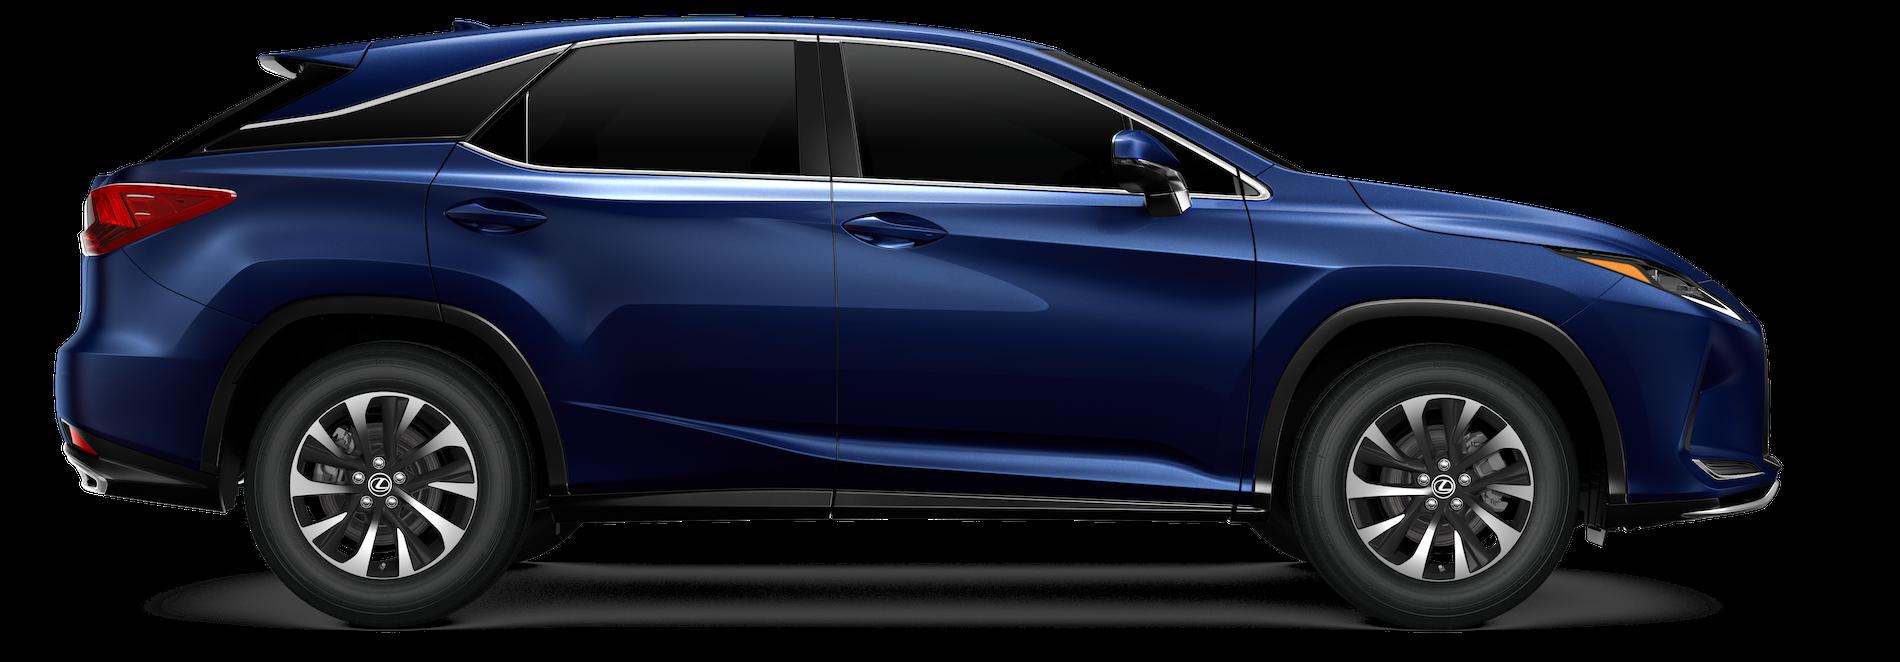 Lexus RX 350 MPG - Lexus RX 350